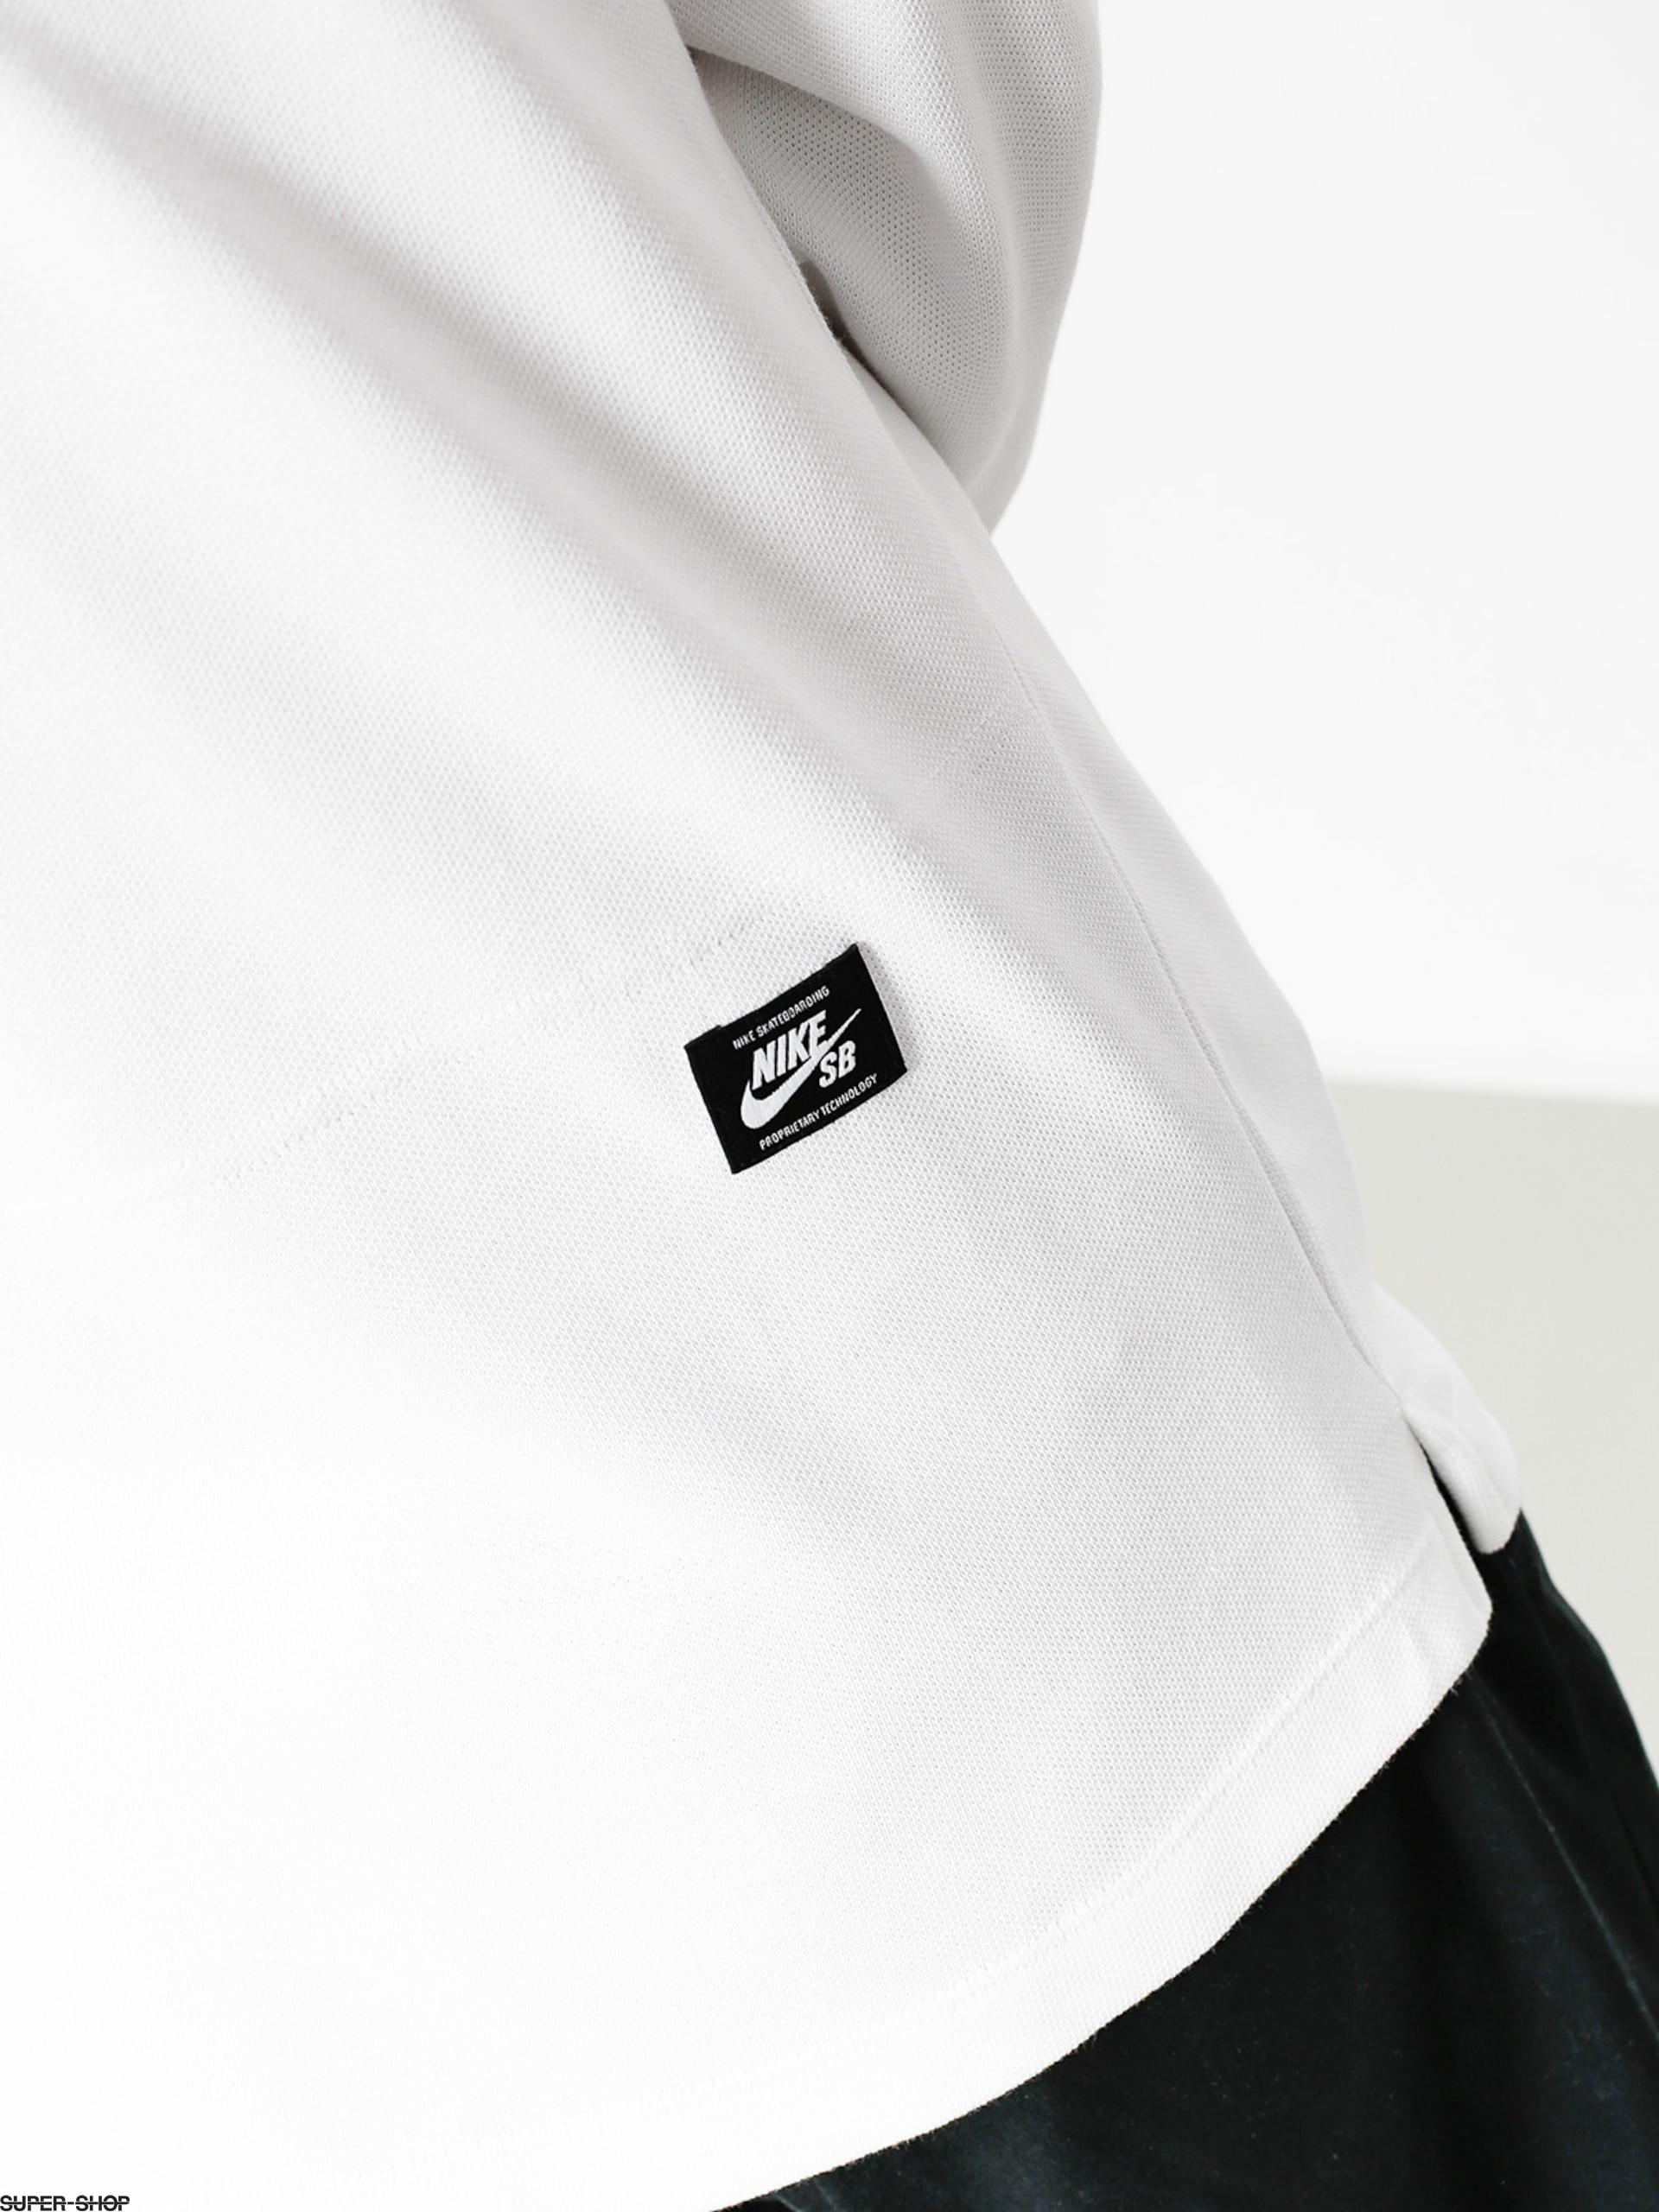 c9d78a9444f Nike SB Longsleeve Dry Top Rugby (white/white)